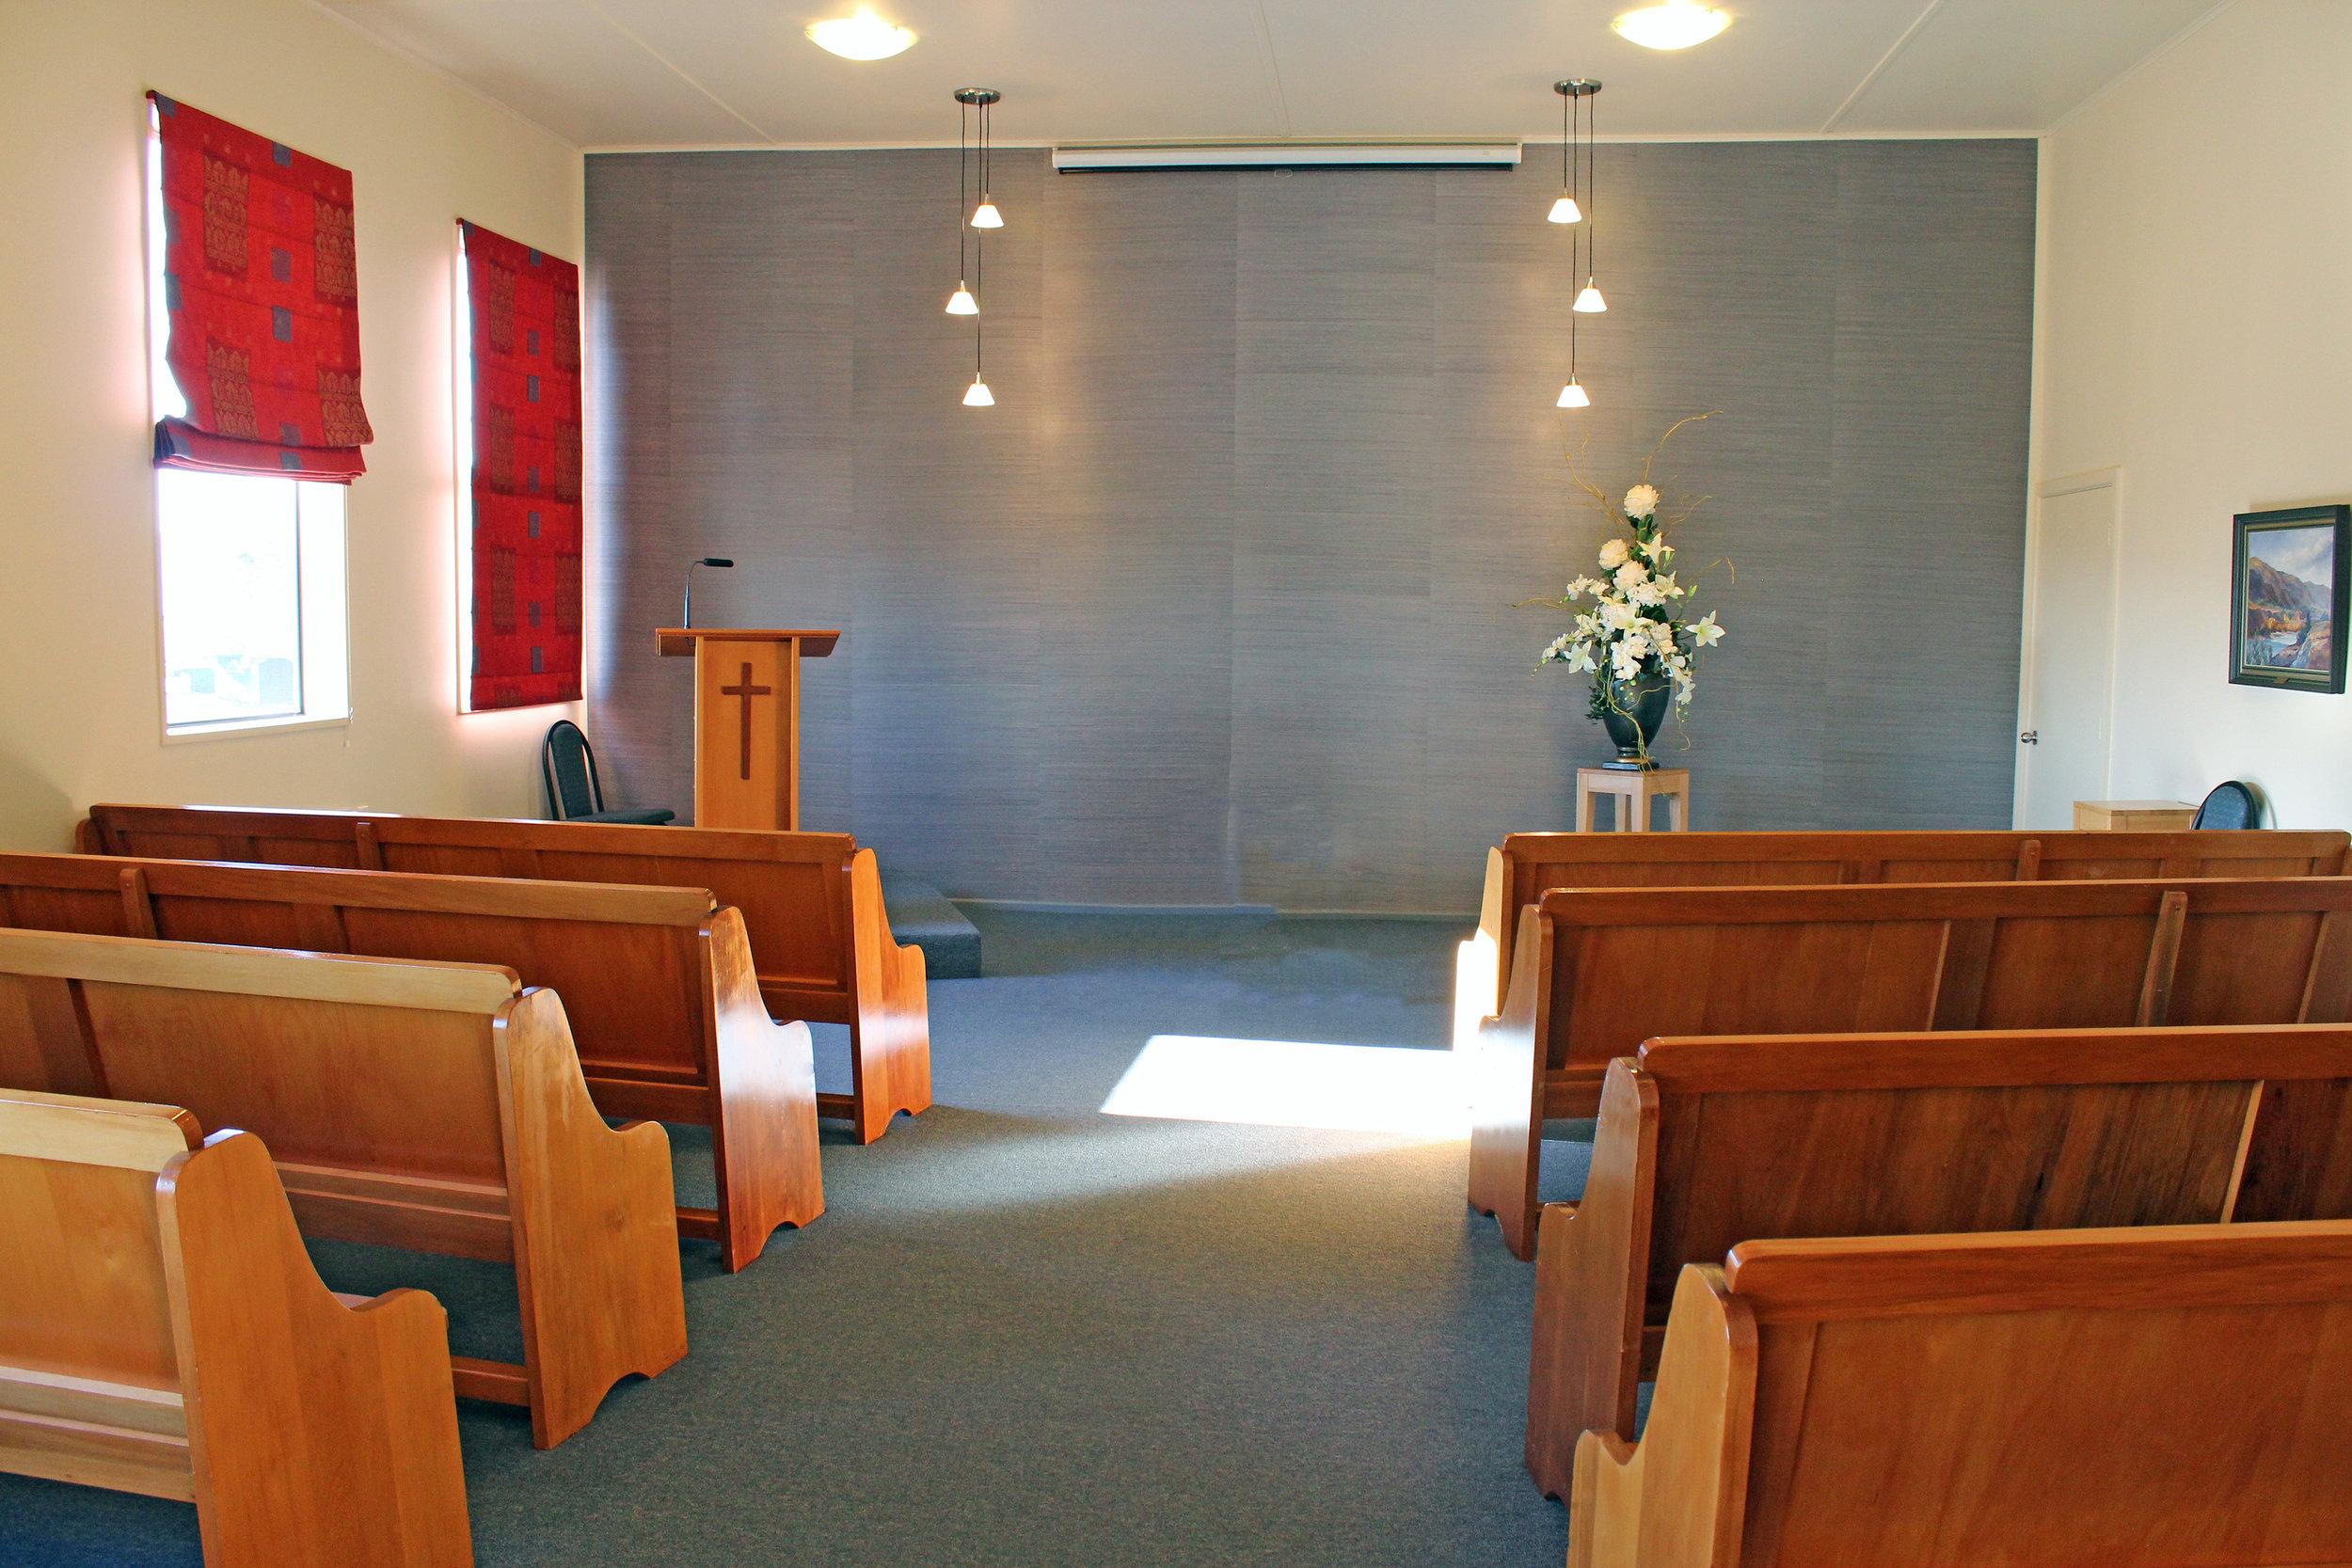 Hilltop Chapel Dunedin  183 Middleton Road Phone:  (03) 455 5074   View on Google Maps